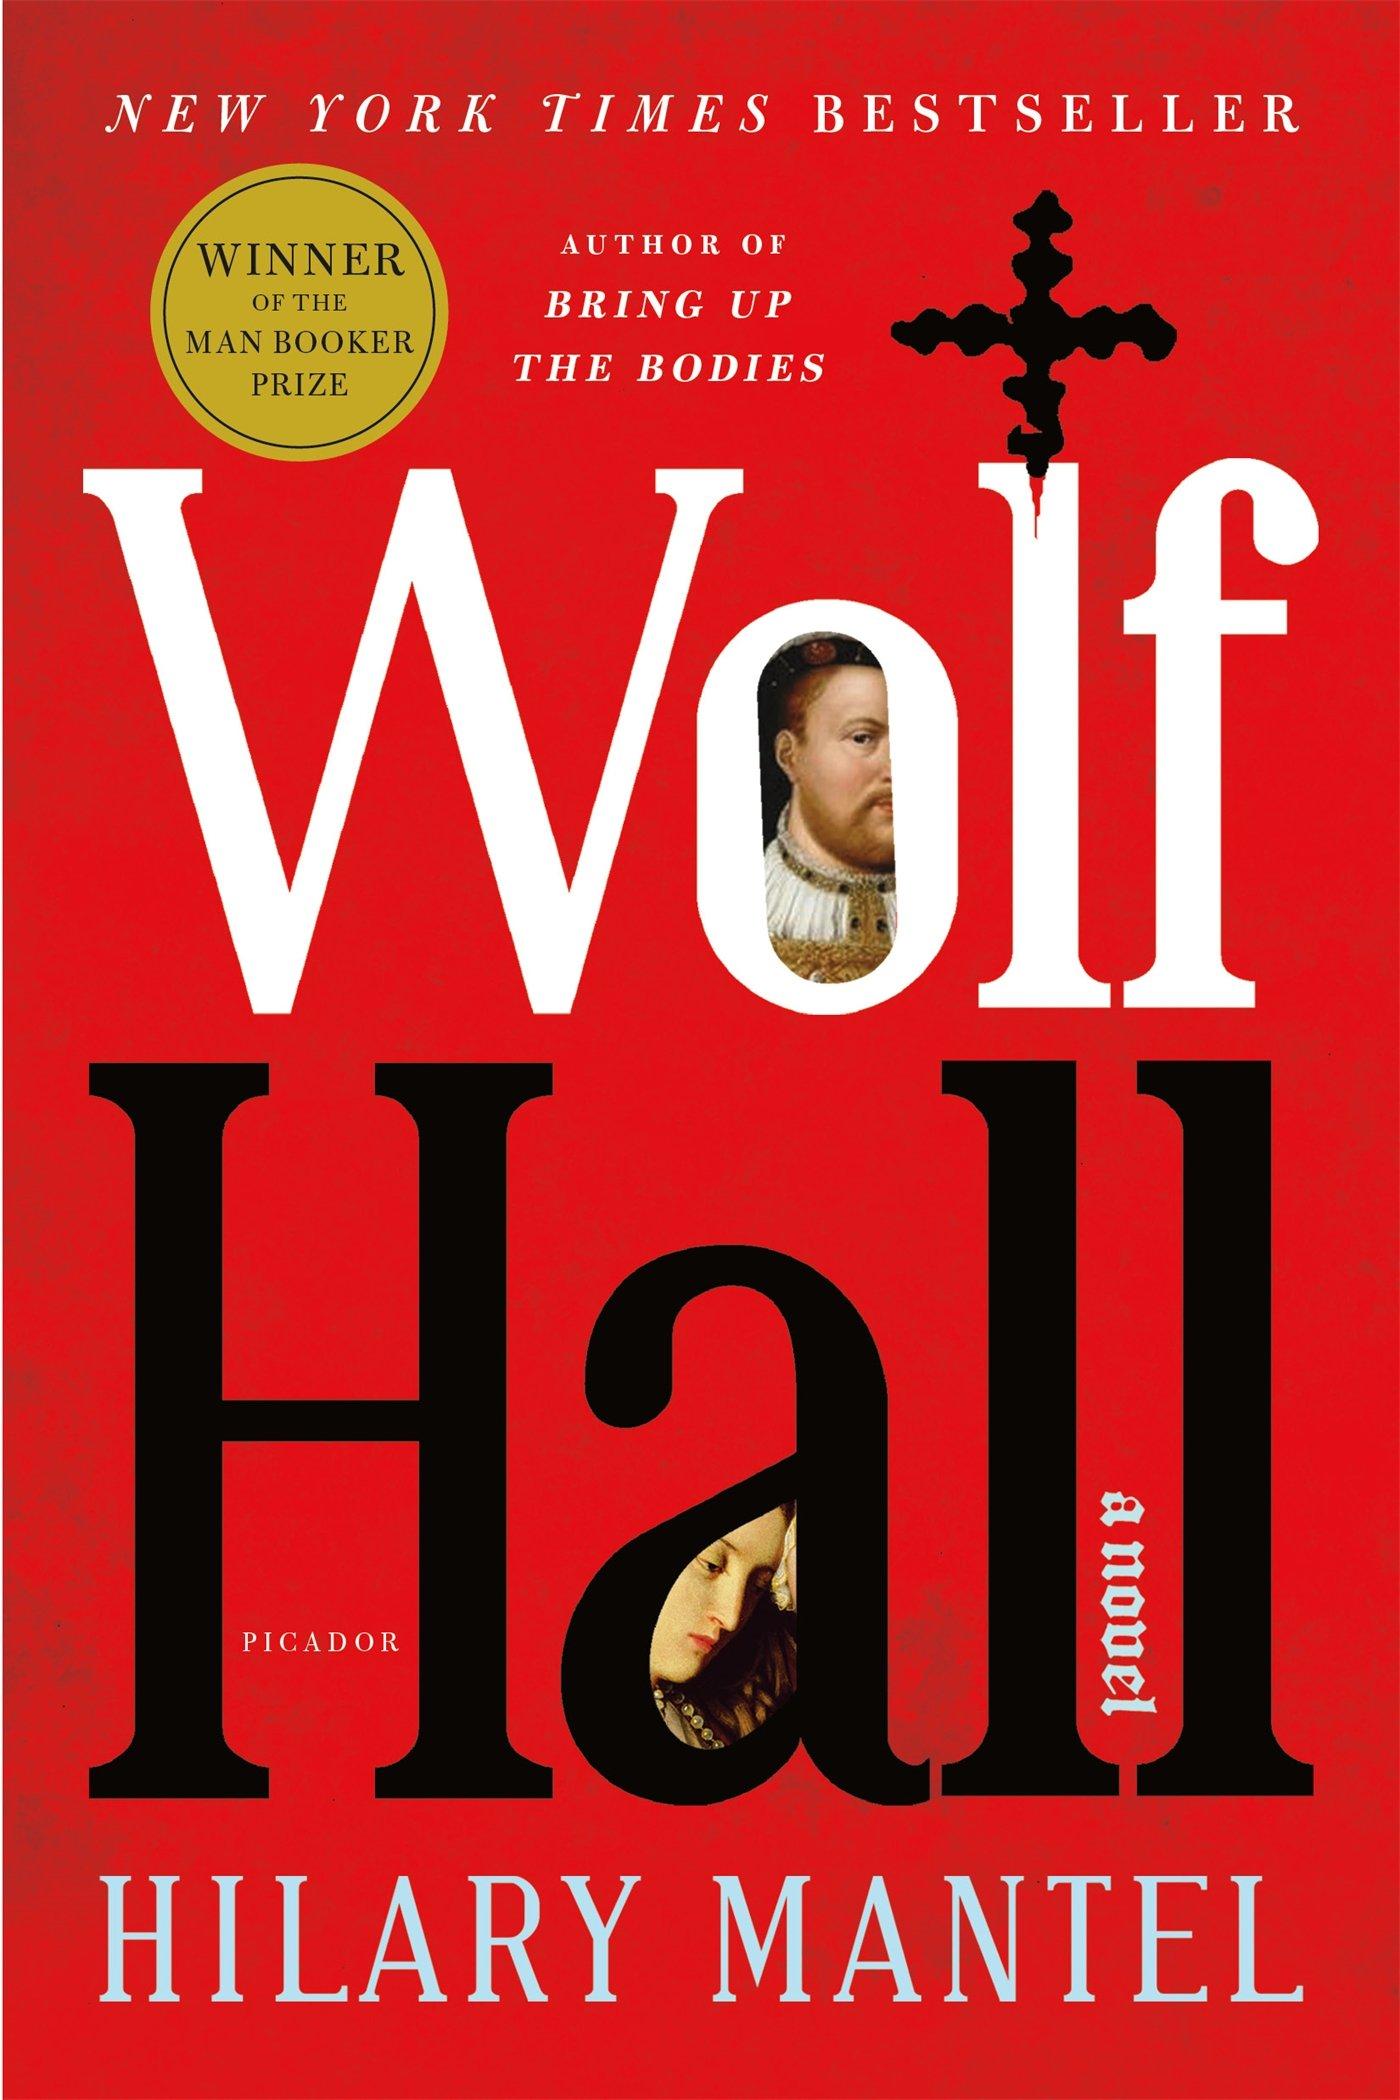 Wolf Hall by Hillary Mantel